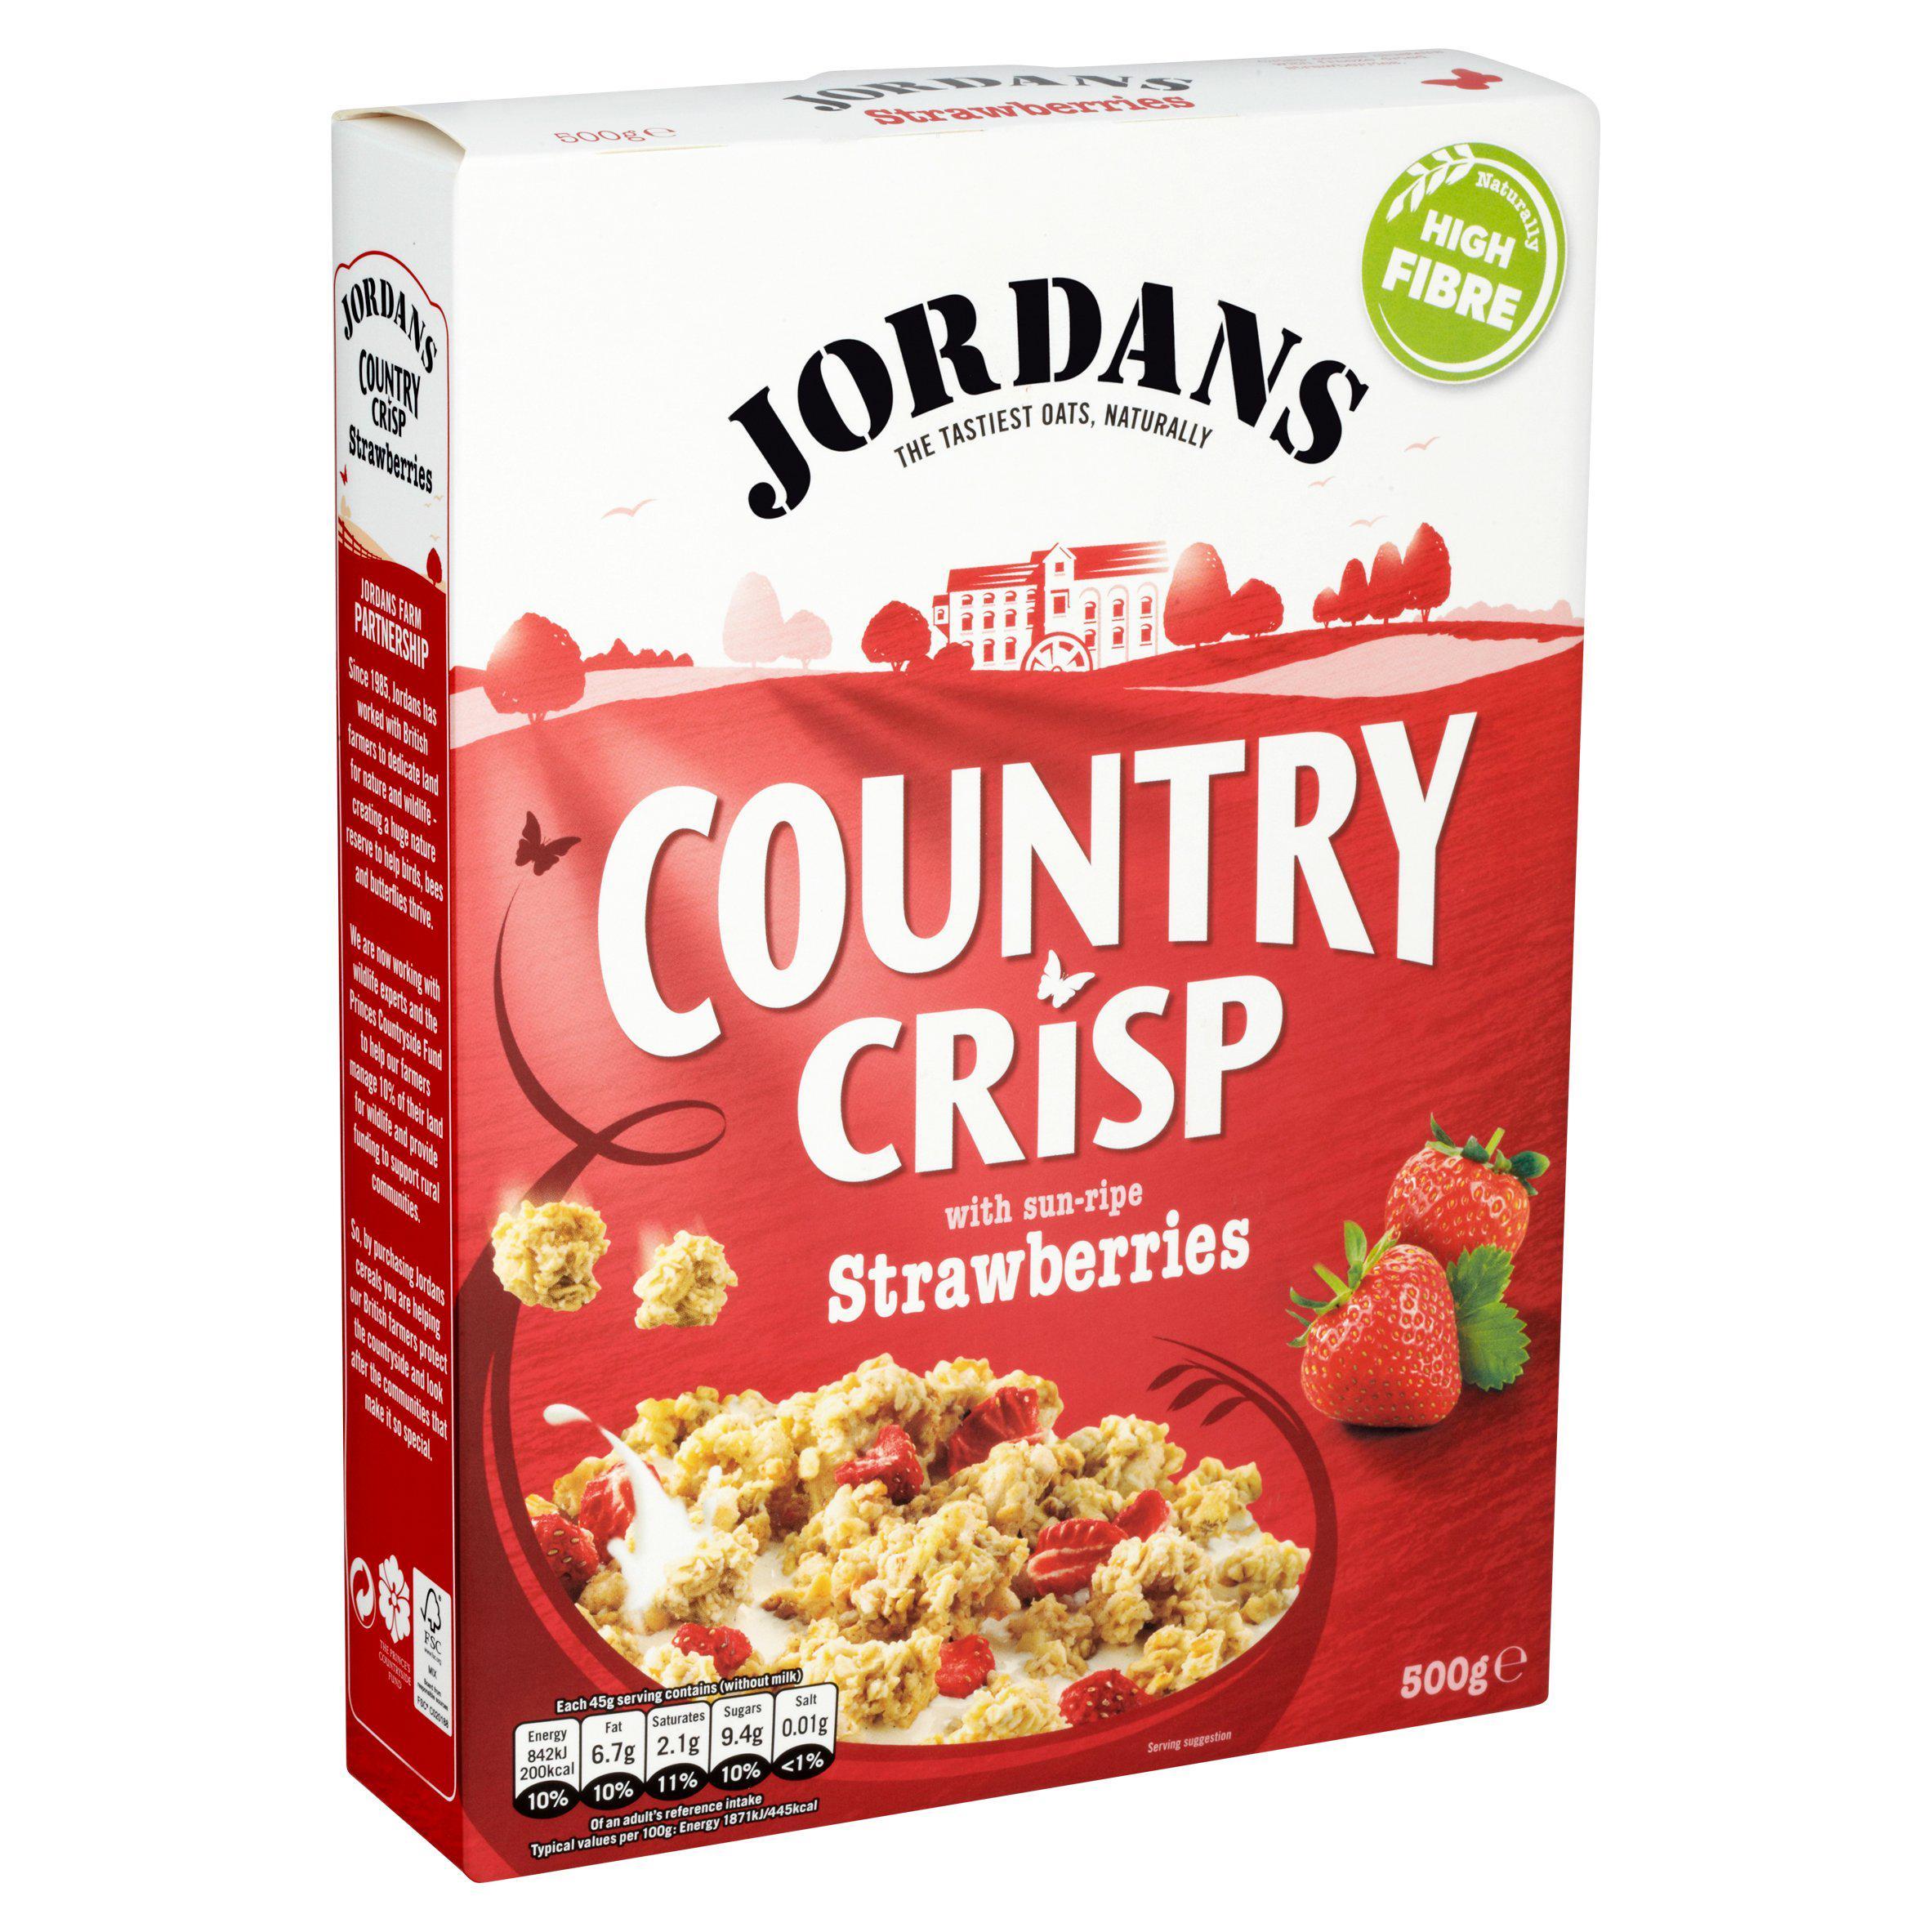 Jordans Country Crisp 500g (Strawberry / Chocolate / Raspberry / Nuts / Raisin) - £1.50 @ Sainsbury's